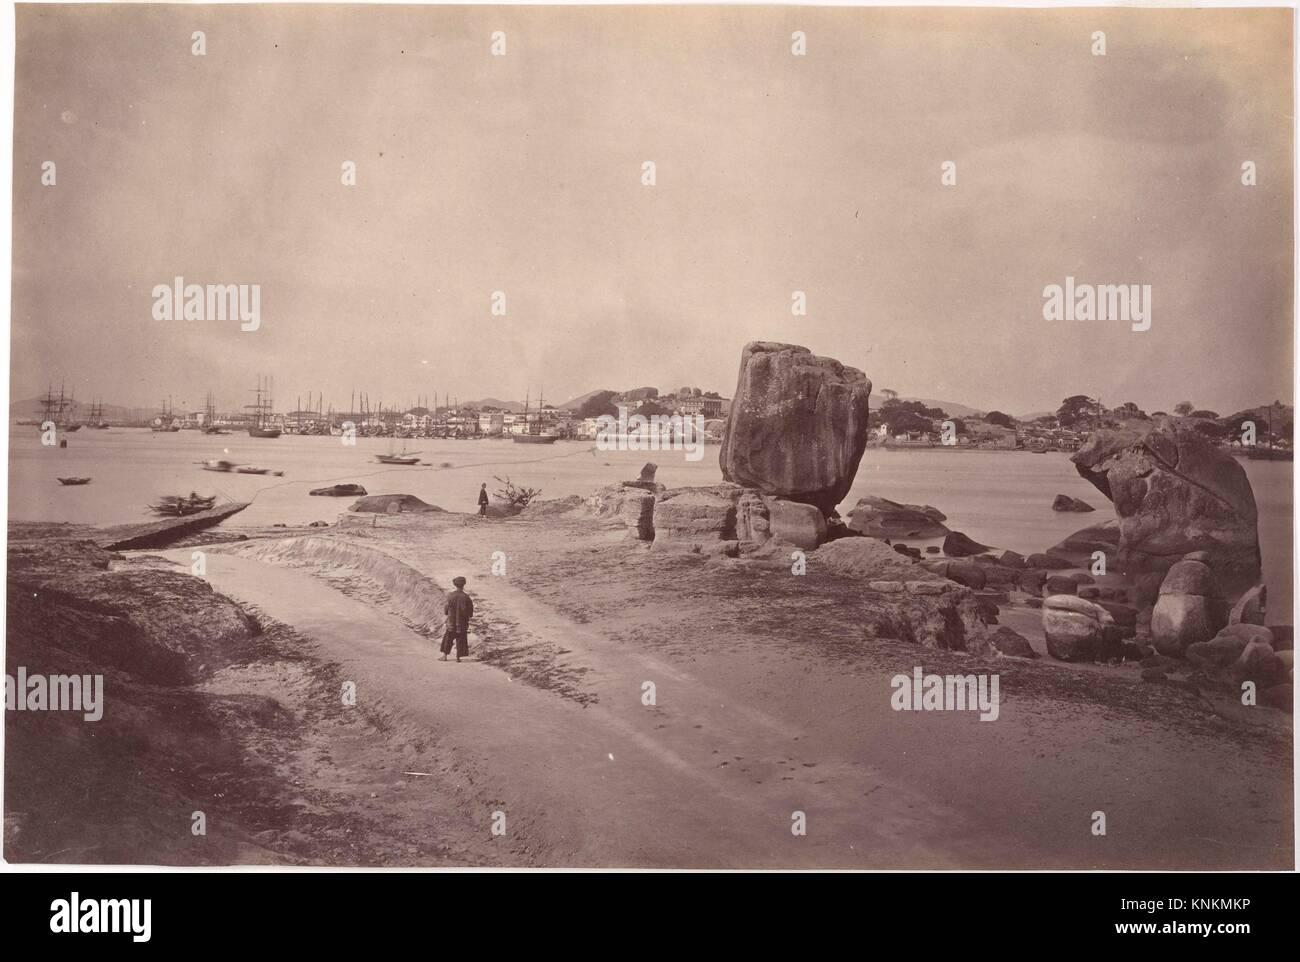 Amoy Harbour. Artist: John Thomson (British, Edinburgh, Scotland 1837-1921 London); Date: ca. 1869; Medium: Albumen - Stock Image